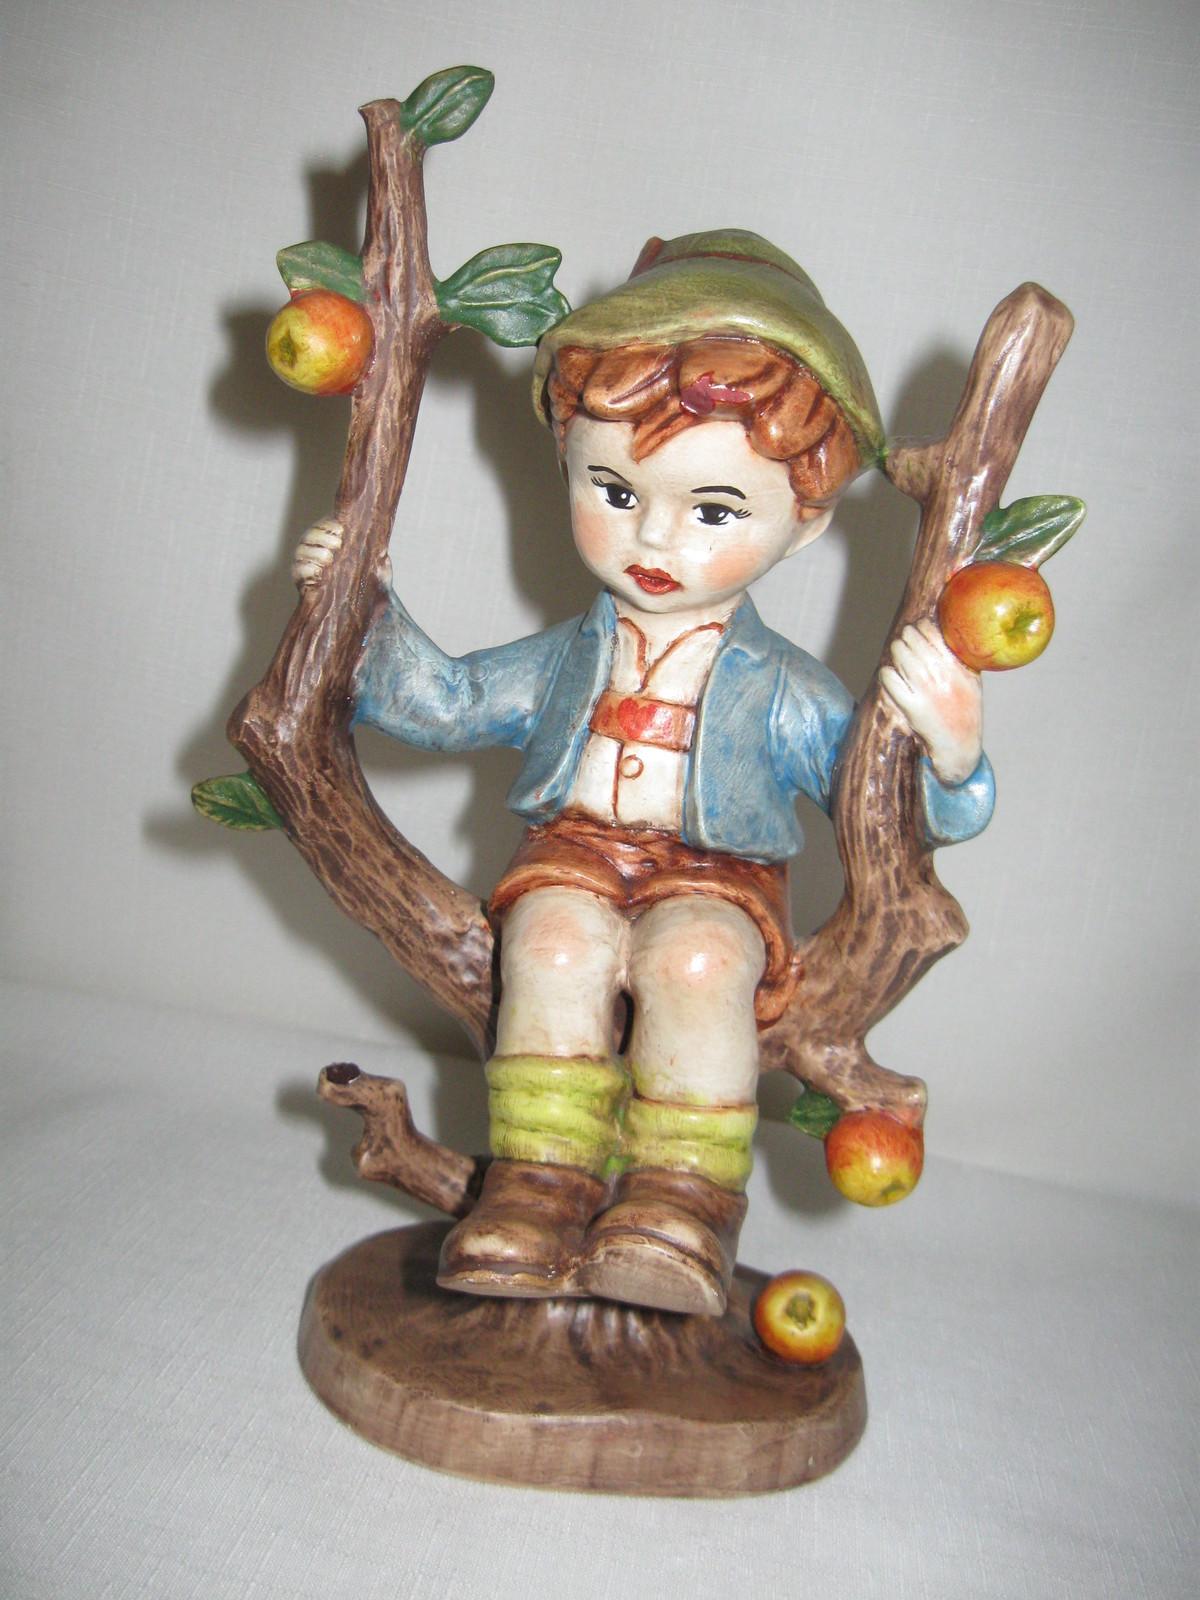 Ceramic Apple Tree Boy Hummel Look A Like Boy Sitting on Branch SN 1981 - $12.95